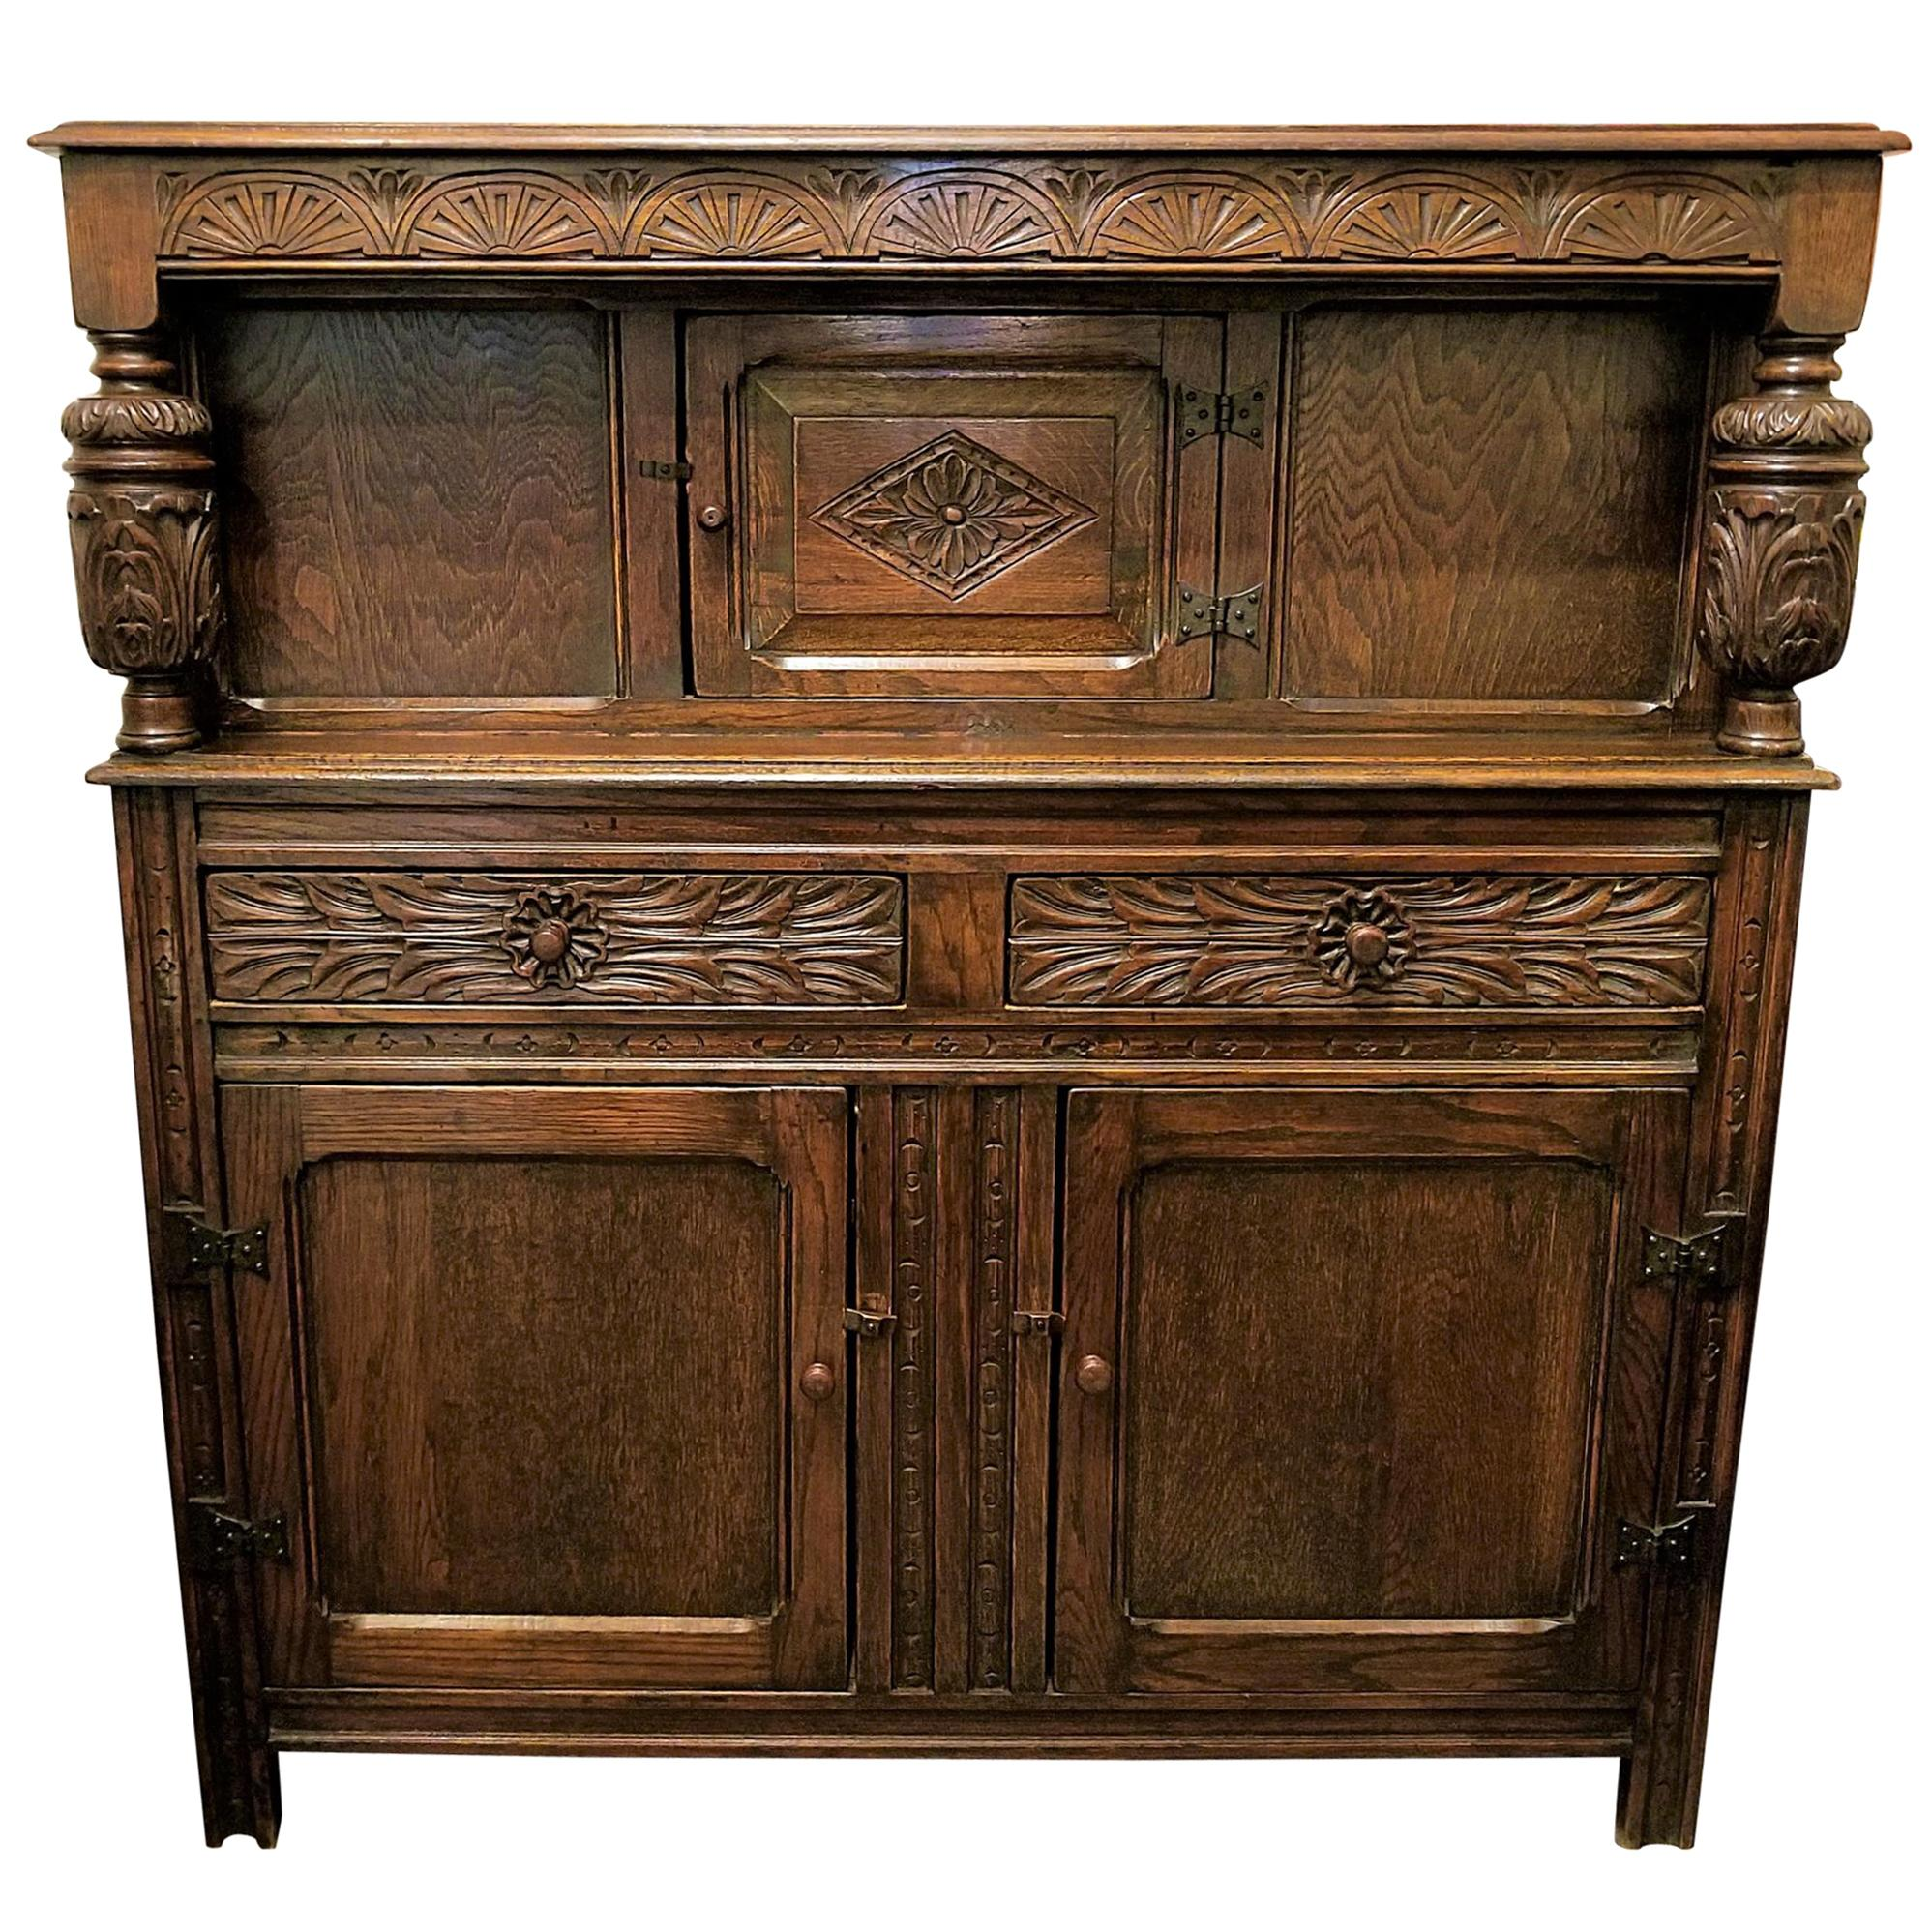 English Oak Renaissance Revival Cabinet